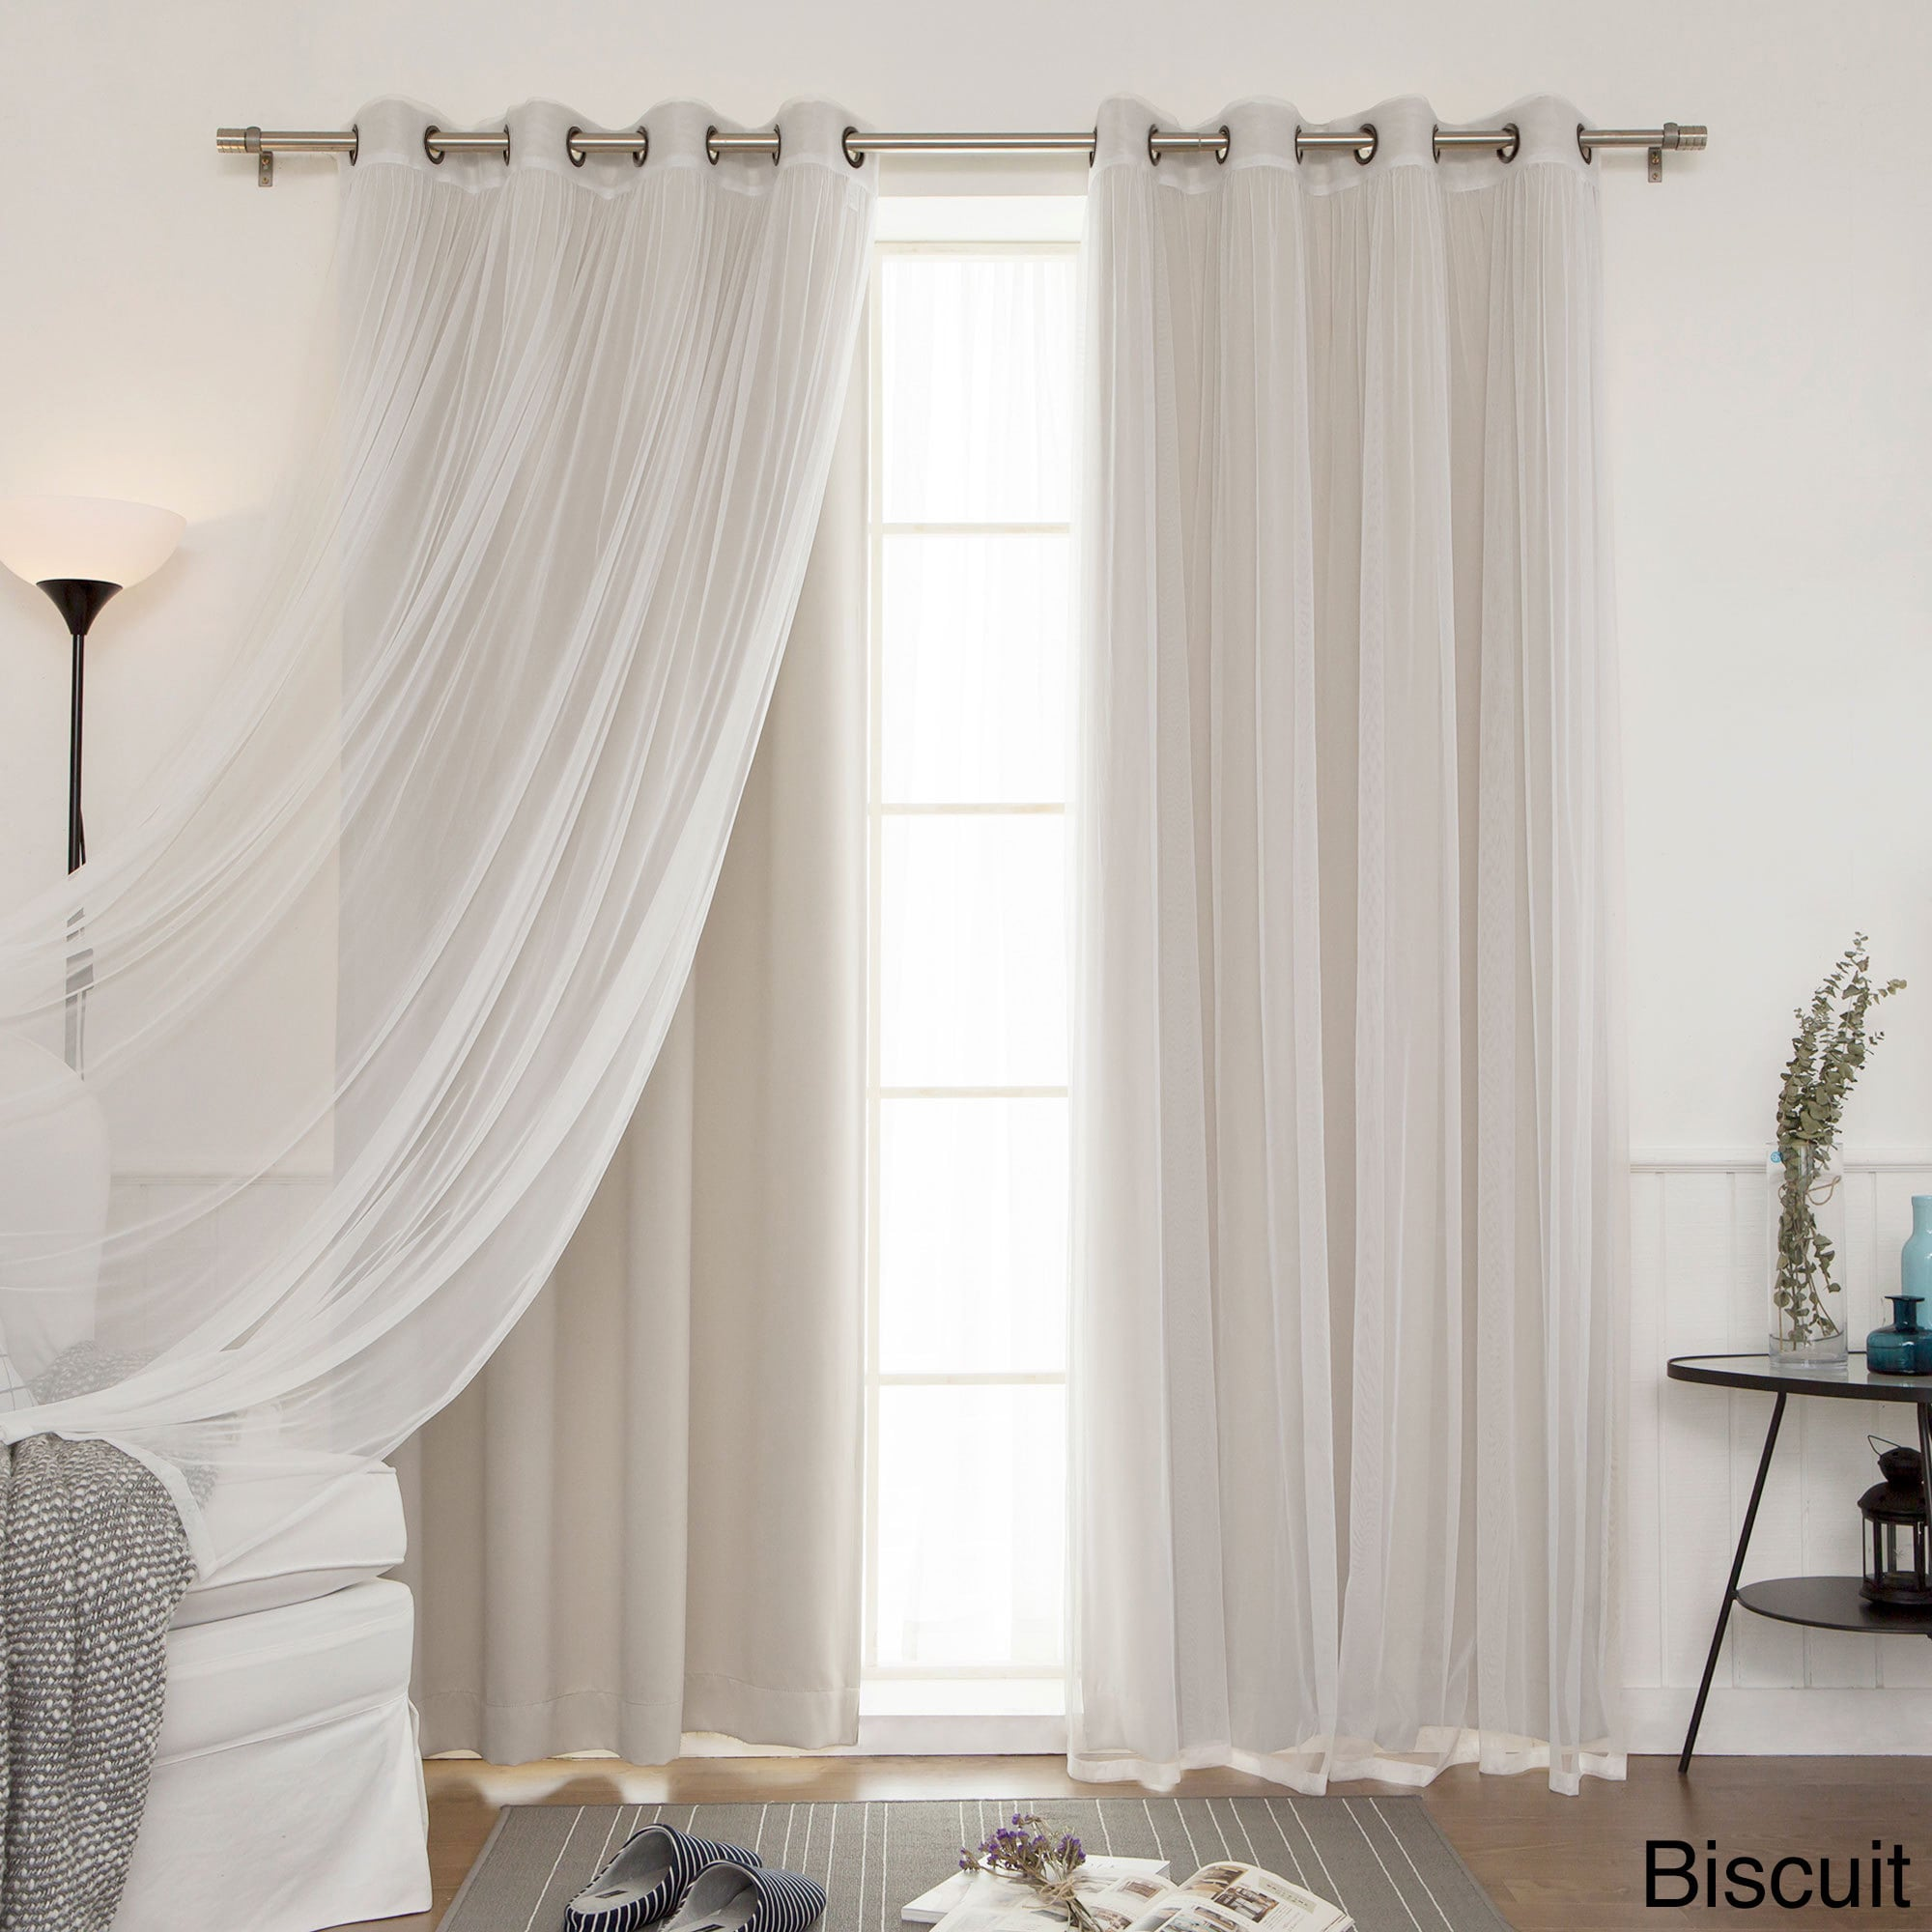 Amazing Aurora Home Mix And Match Blackout Blackout Curtains Panel Set (4 Piece) ( Ideas